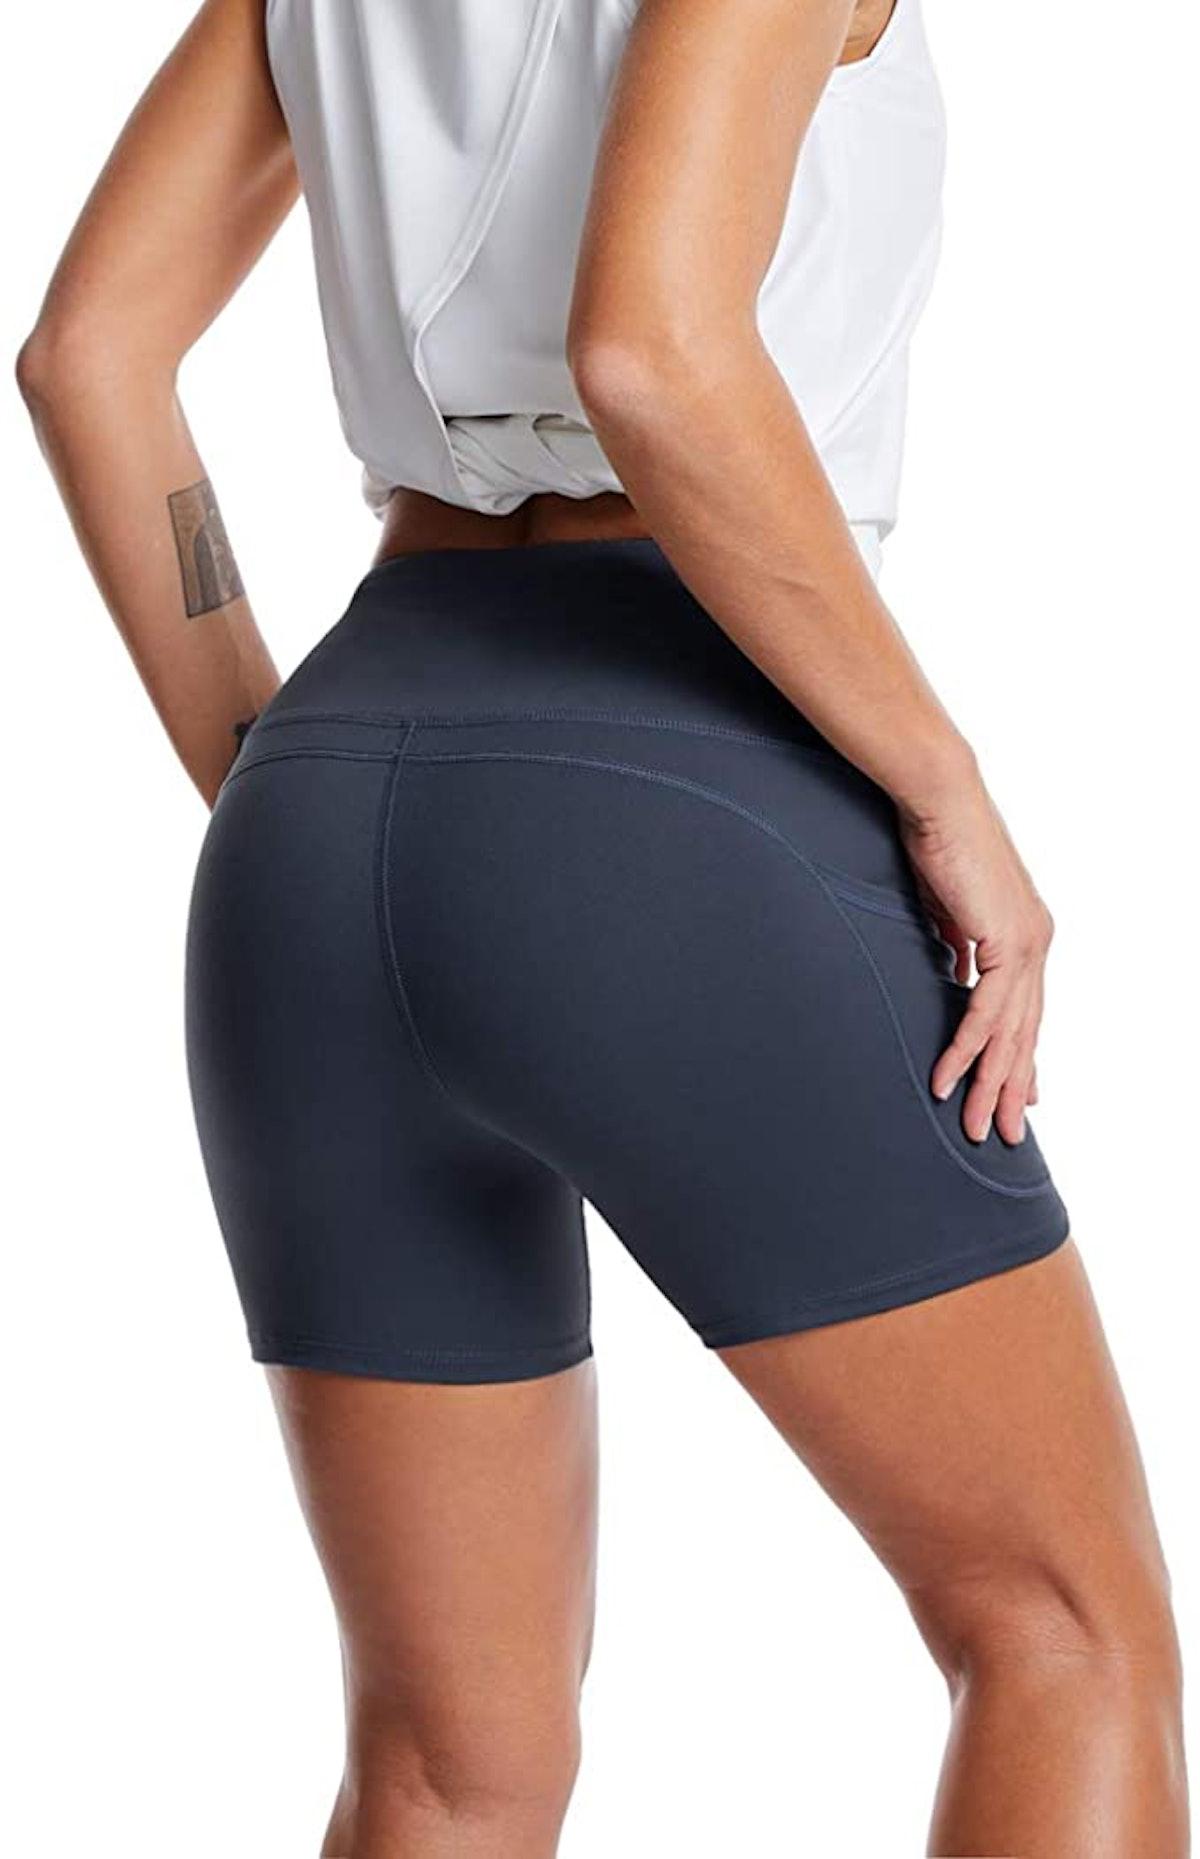 THE GYM PEOPLE High Waist Yoga Shorts